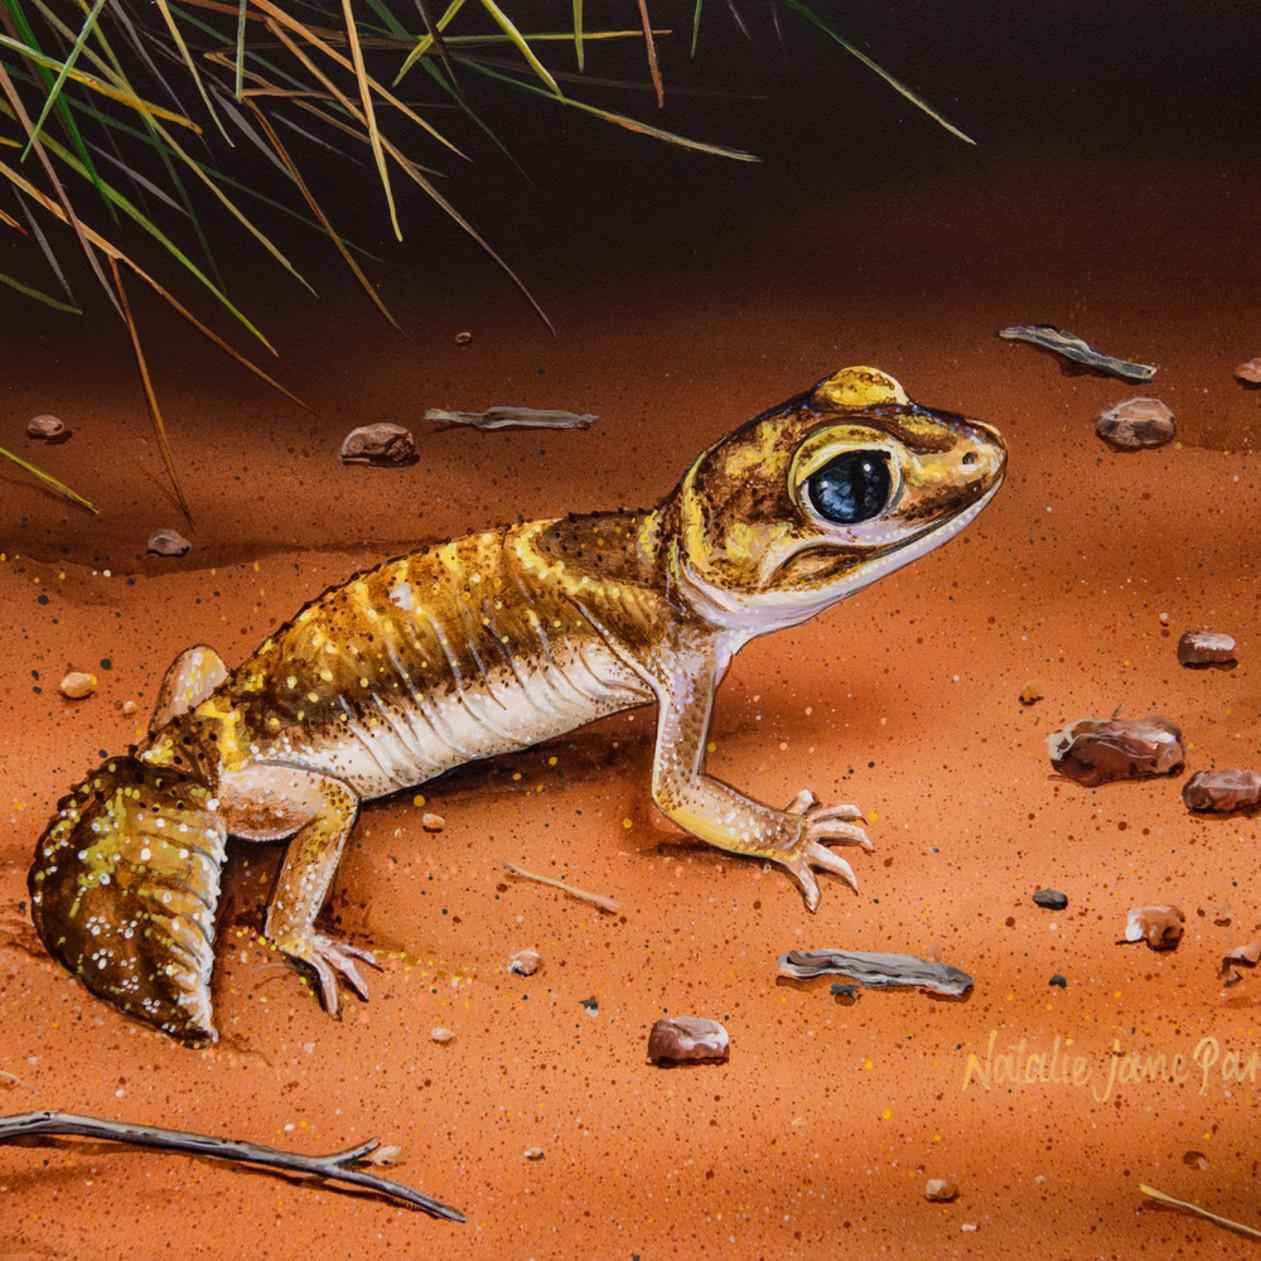 Desert dweller   west coast three lined knob tailed gecko natalie jane parker australian native wildlife giv261